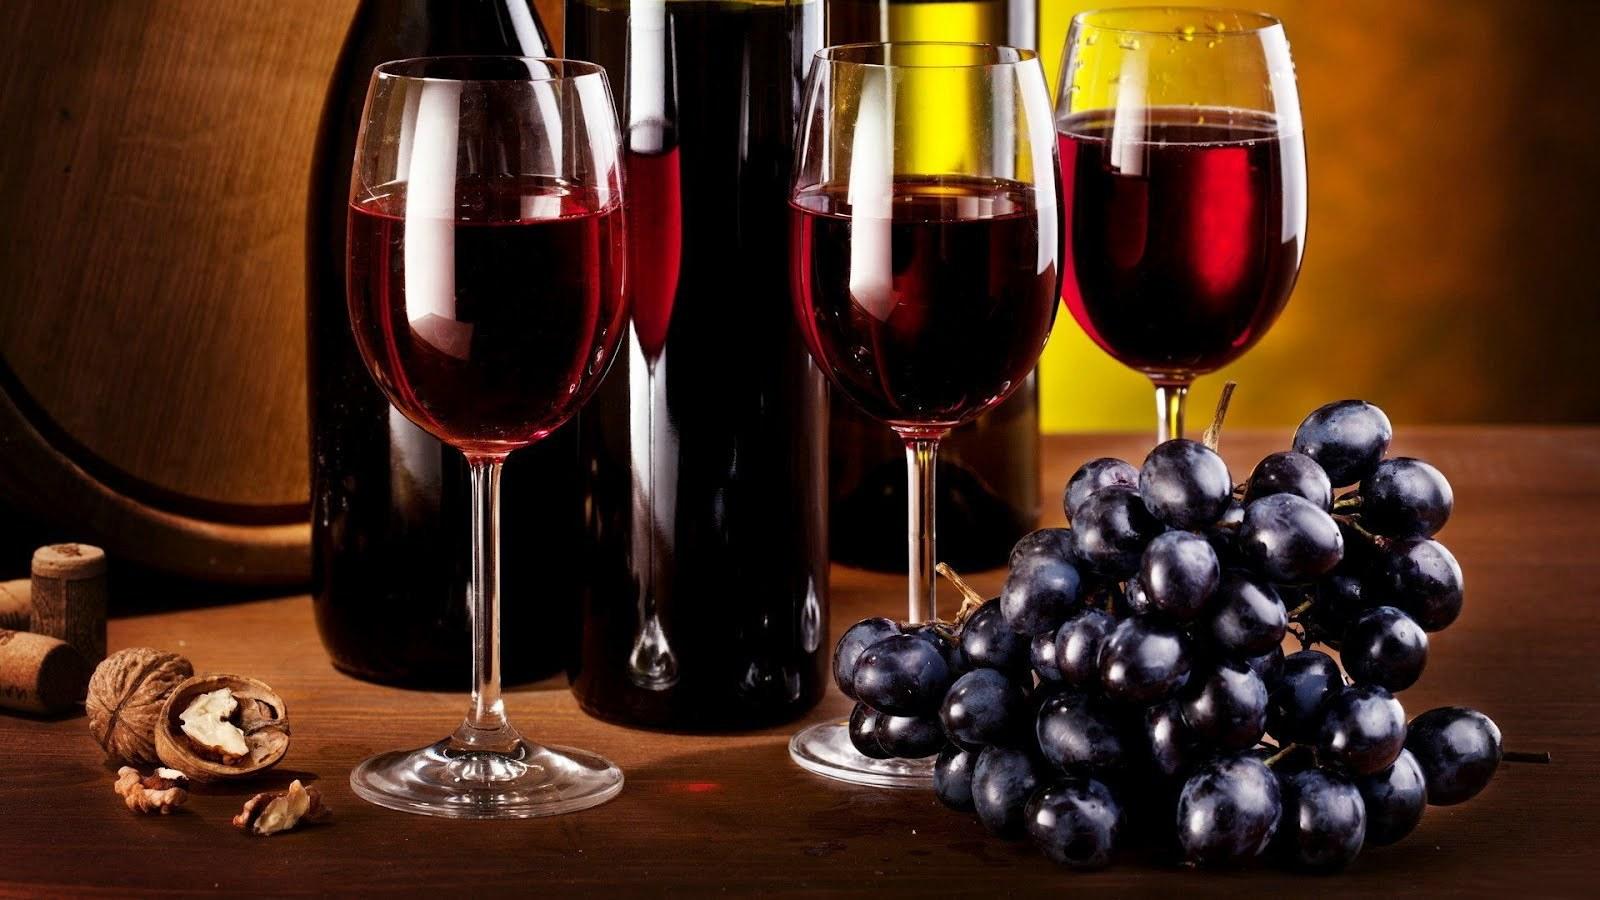 Offrir du vin: choisir un cadeau singulier